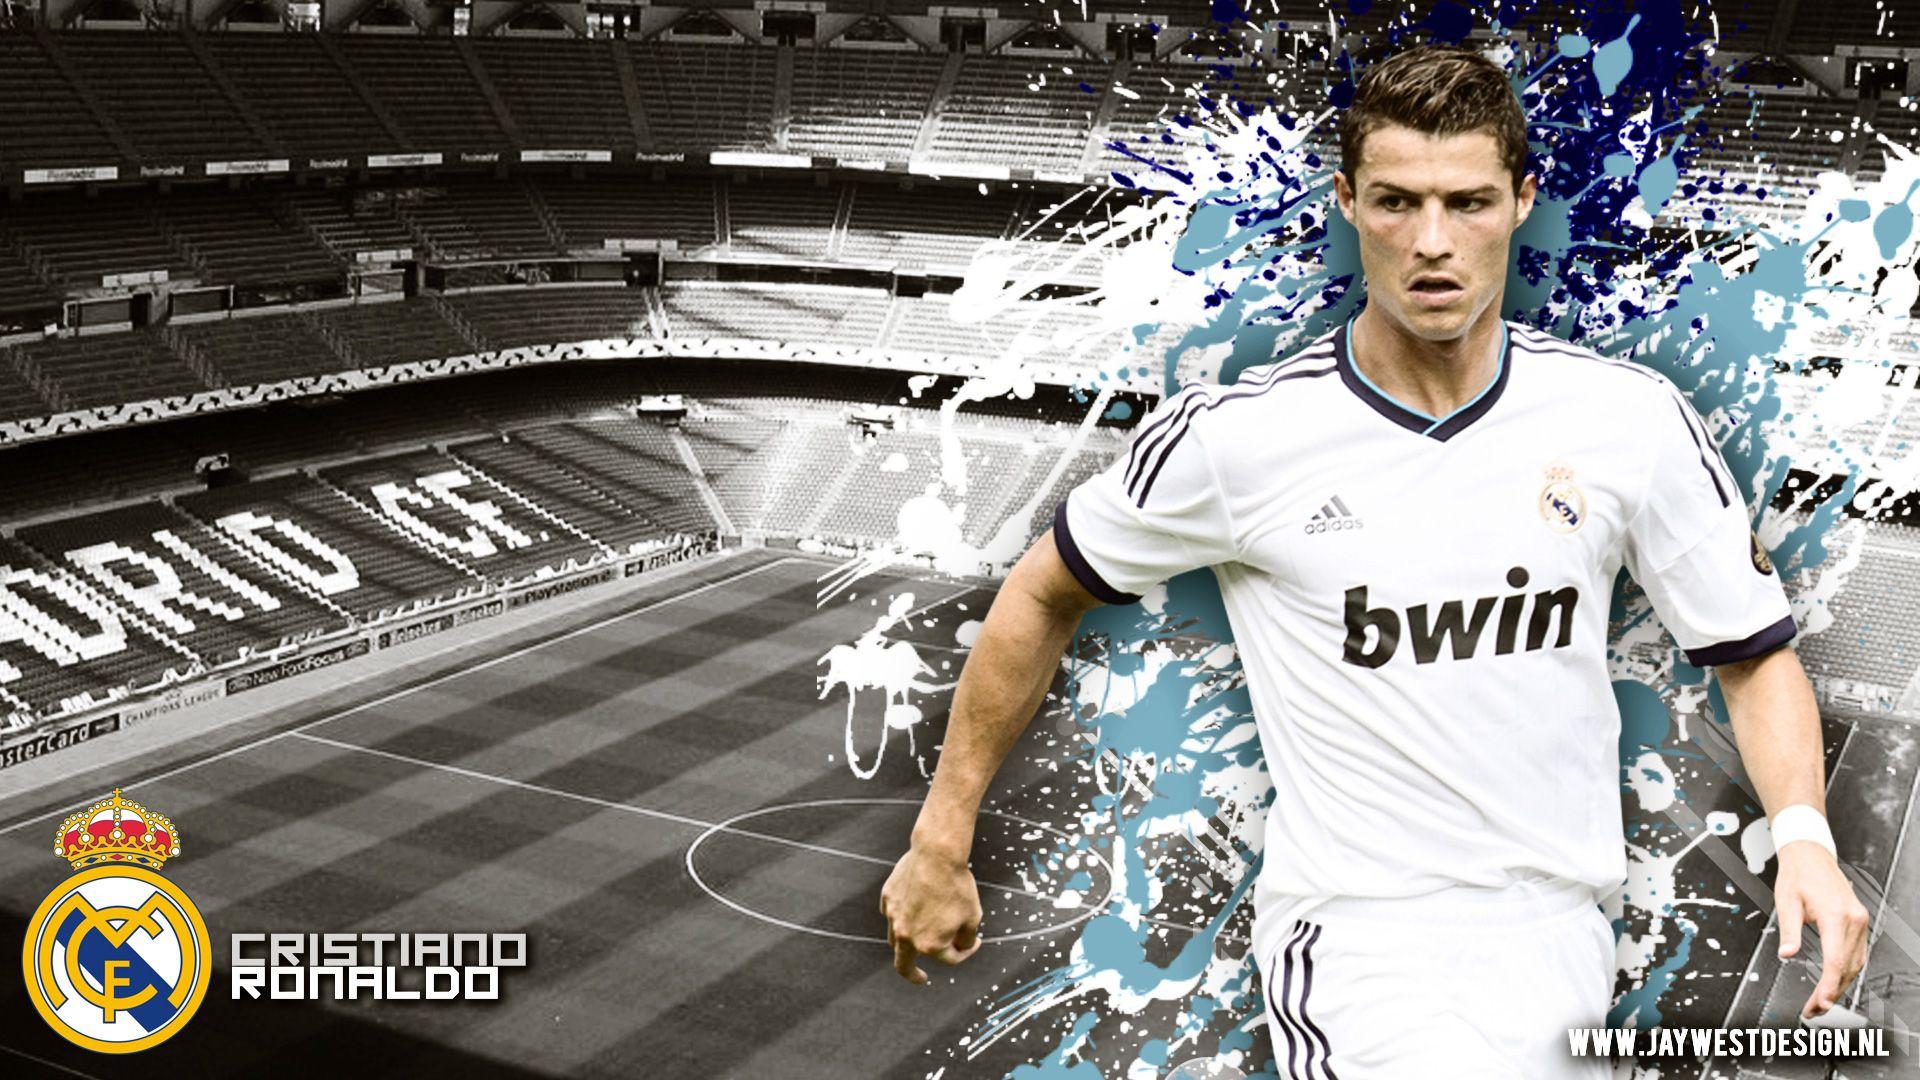 football real madrid wallpaper hd 2013 - http://www.wallpapersoccer